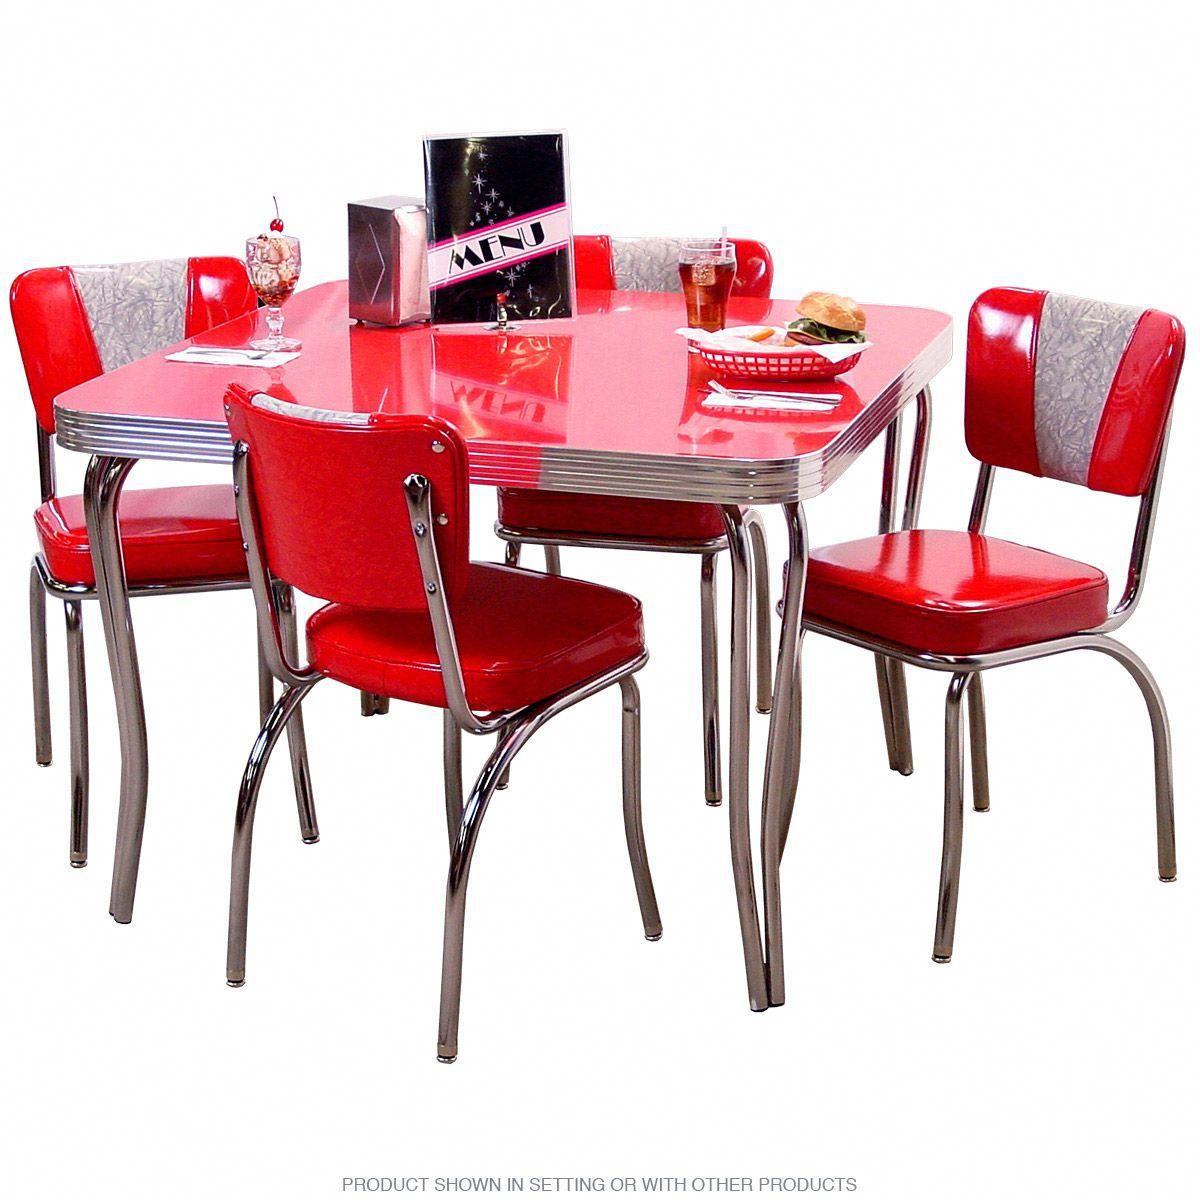 15 Small Dining Room Table Ideas Tips: 50s Kitchen Decor, Retro Kitchen